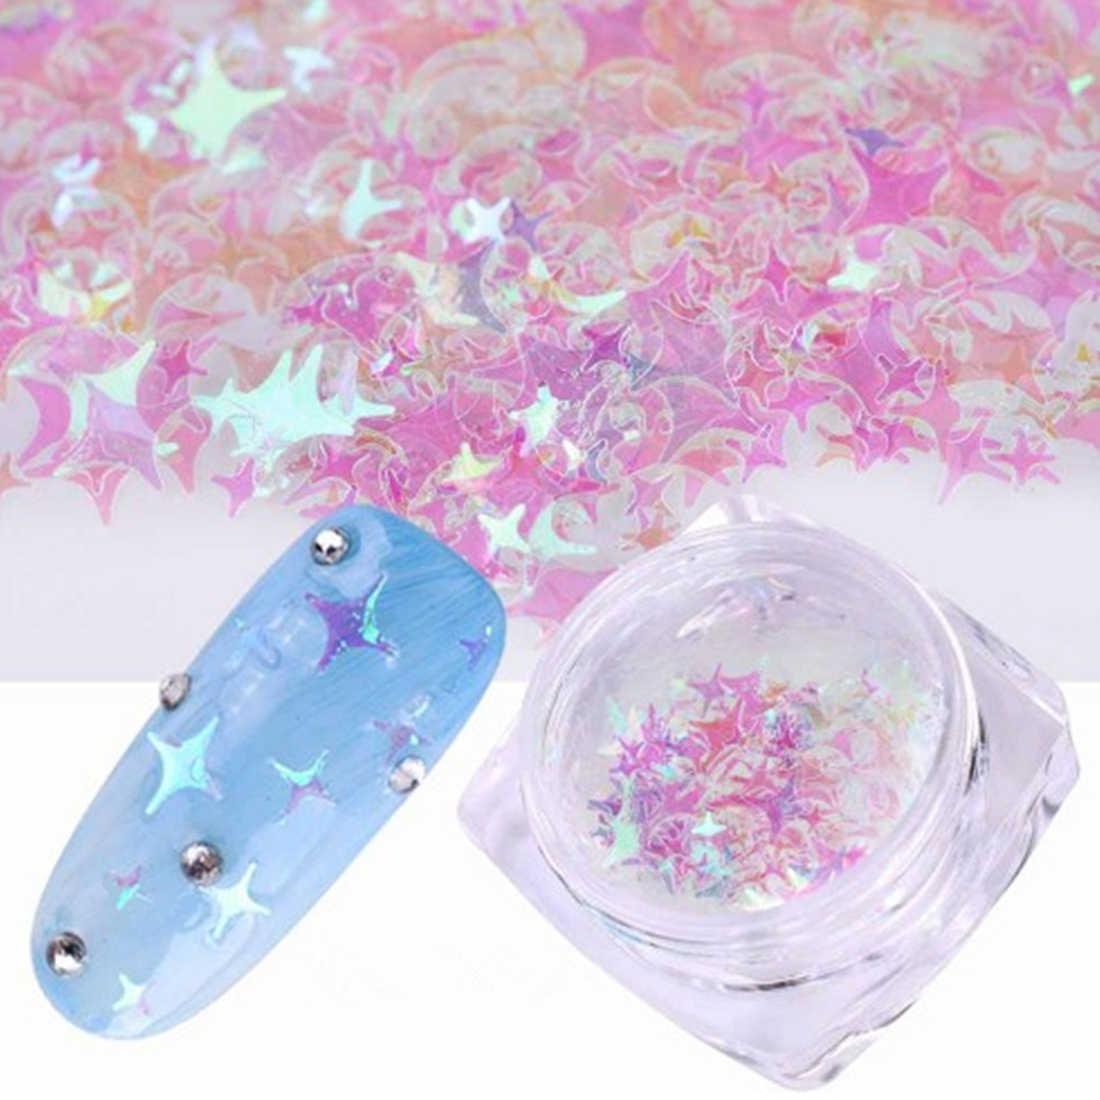 Glittering Nail Flake Paillette untuk Nail Art Dekorasi DIY Fantasy 3/4mm Mix Ukuran Empat Sudut Bentuk Bintang Lucency Cantik Sequin